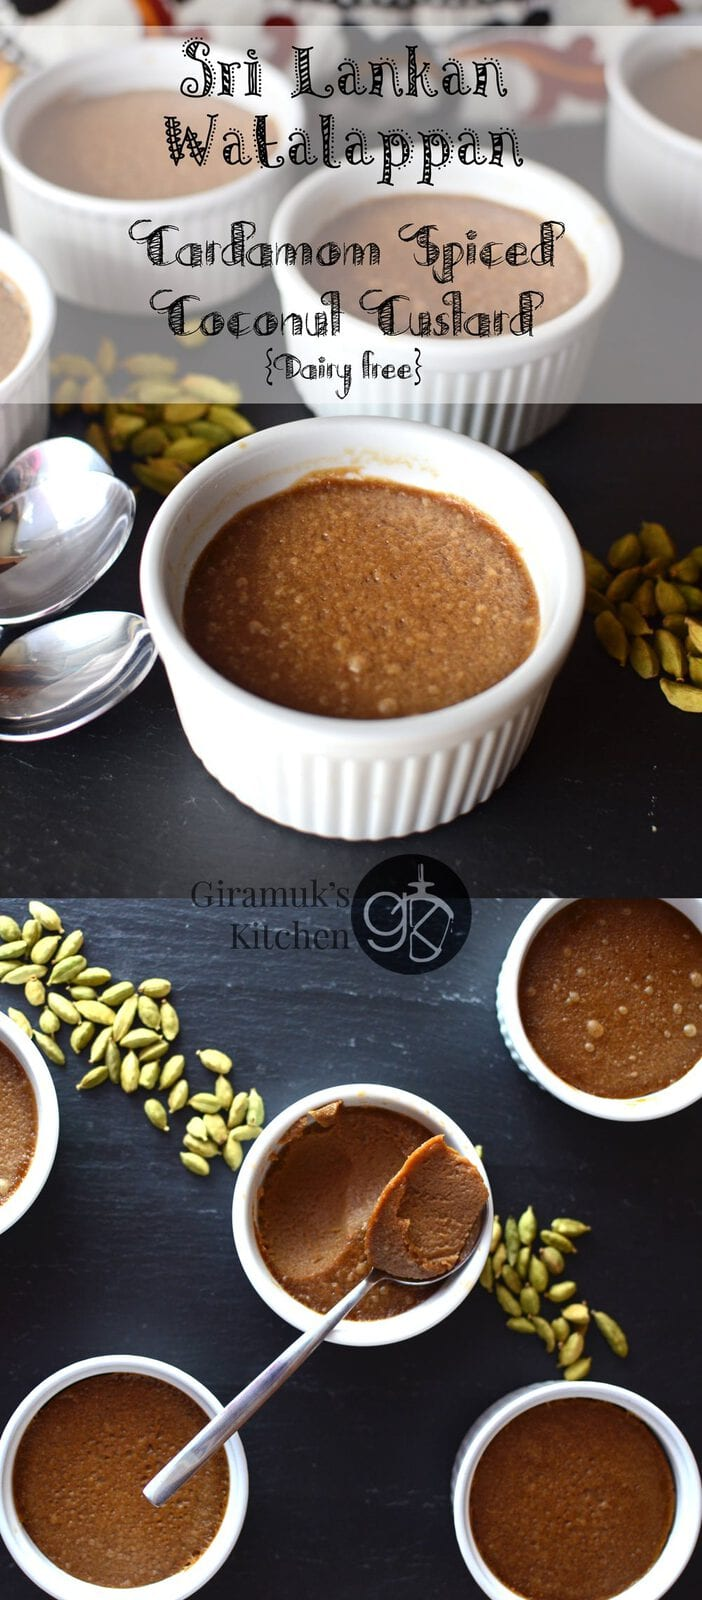 Sri Lankan Watalappan {Cardamom Spiced Coconut Custard}